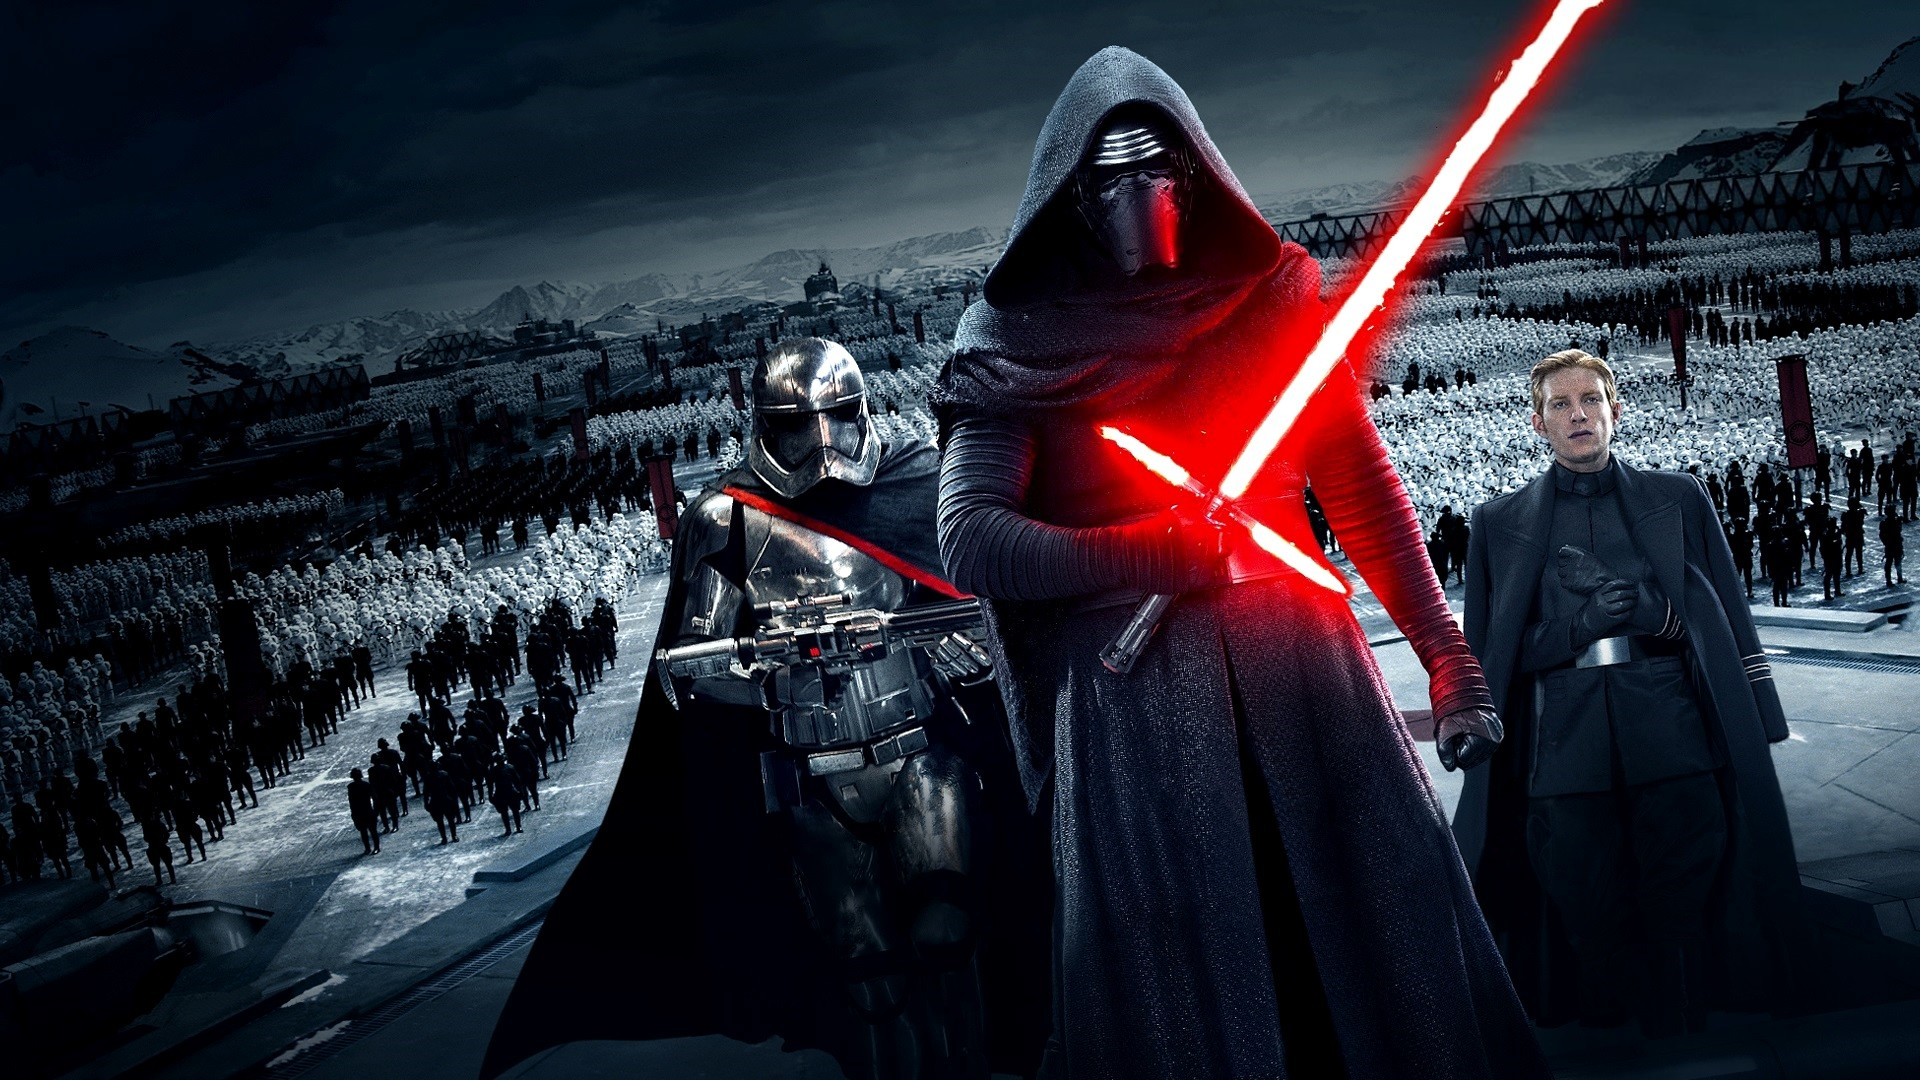 … Star Wars Episode VII The Force Awakens (4) …